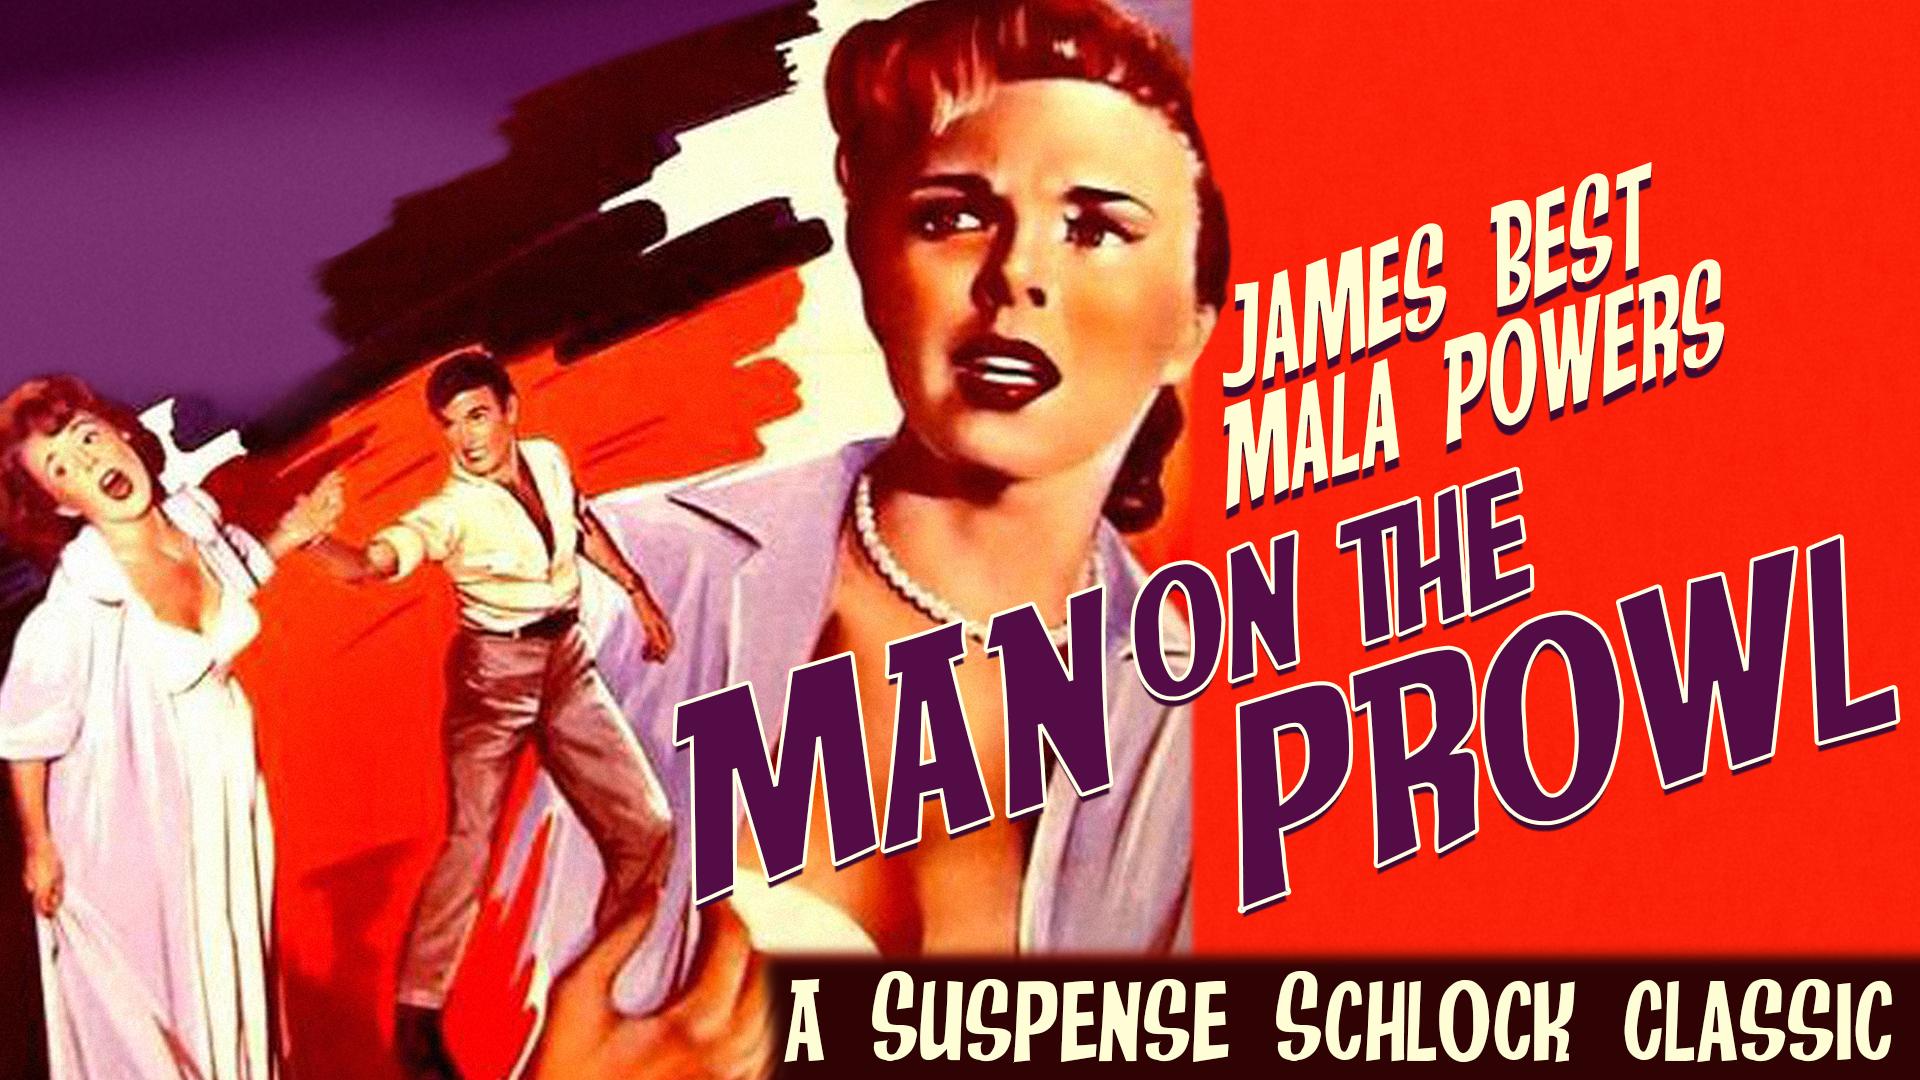 Man On The Prowl - James Best, Mala Powers, A Suspense Schlock Classic!